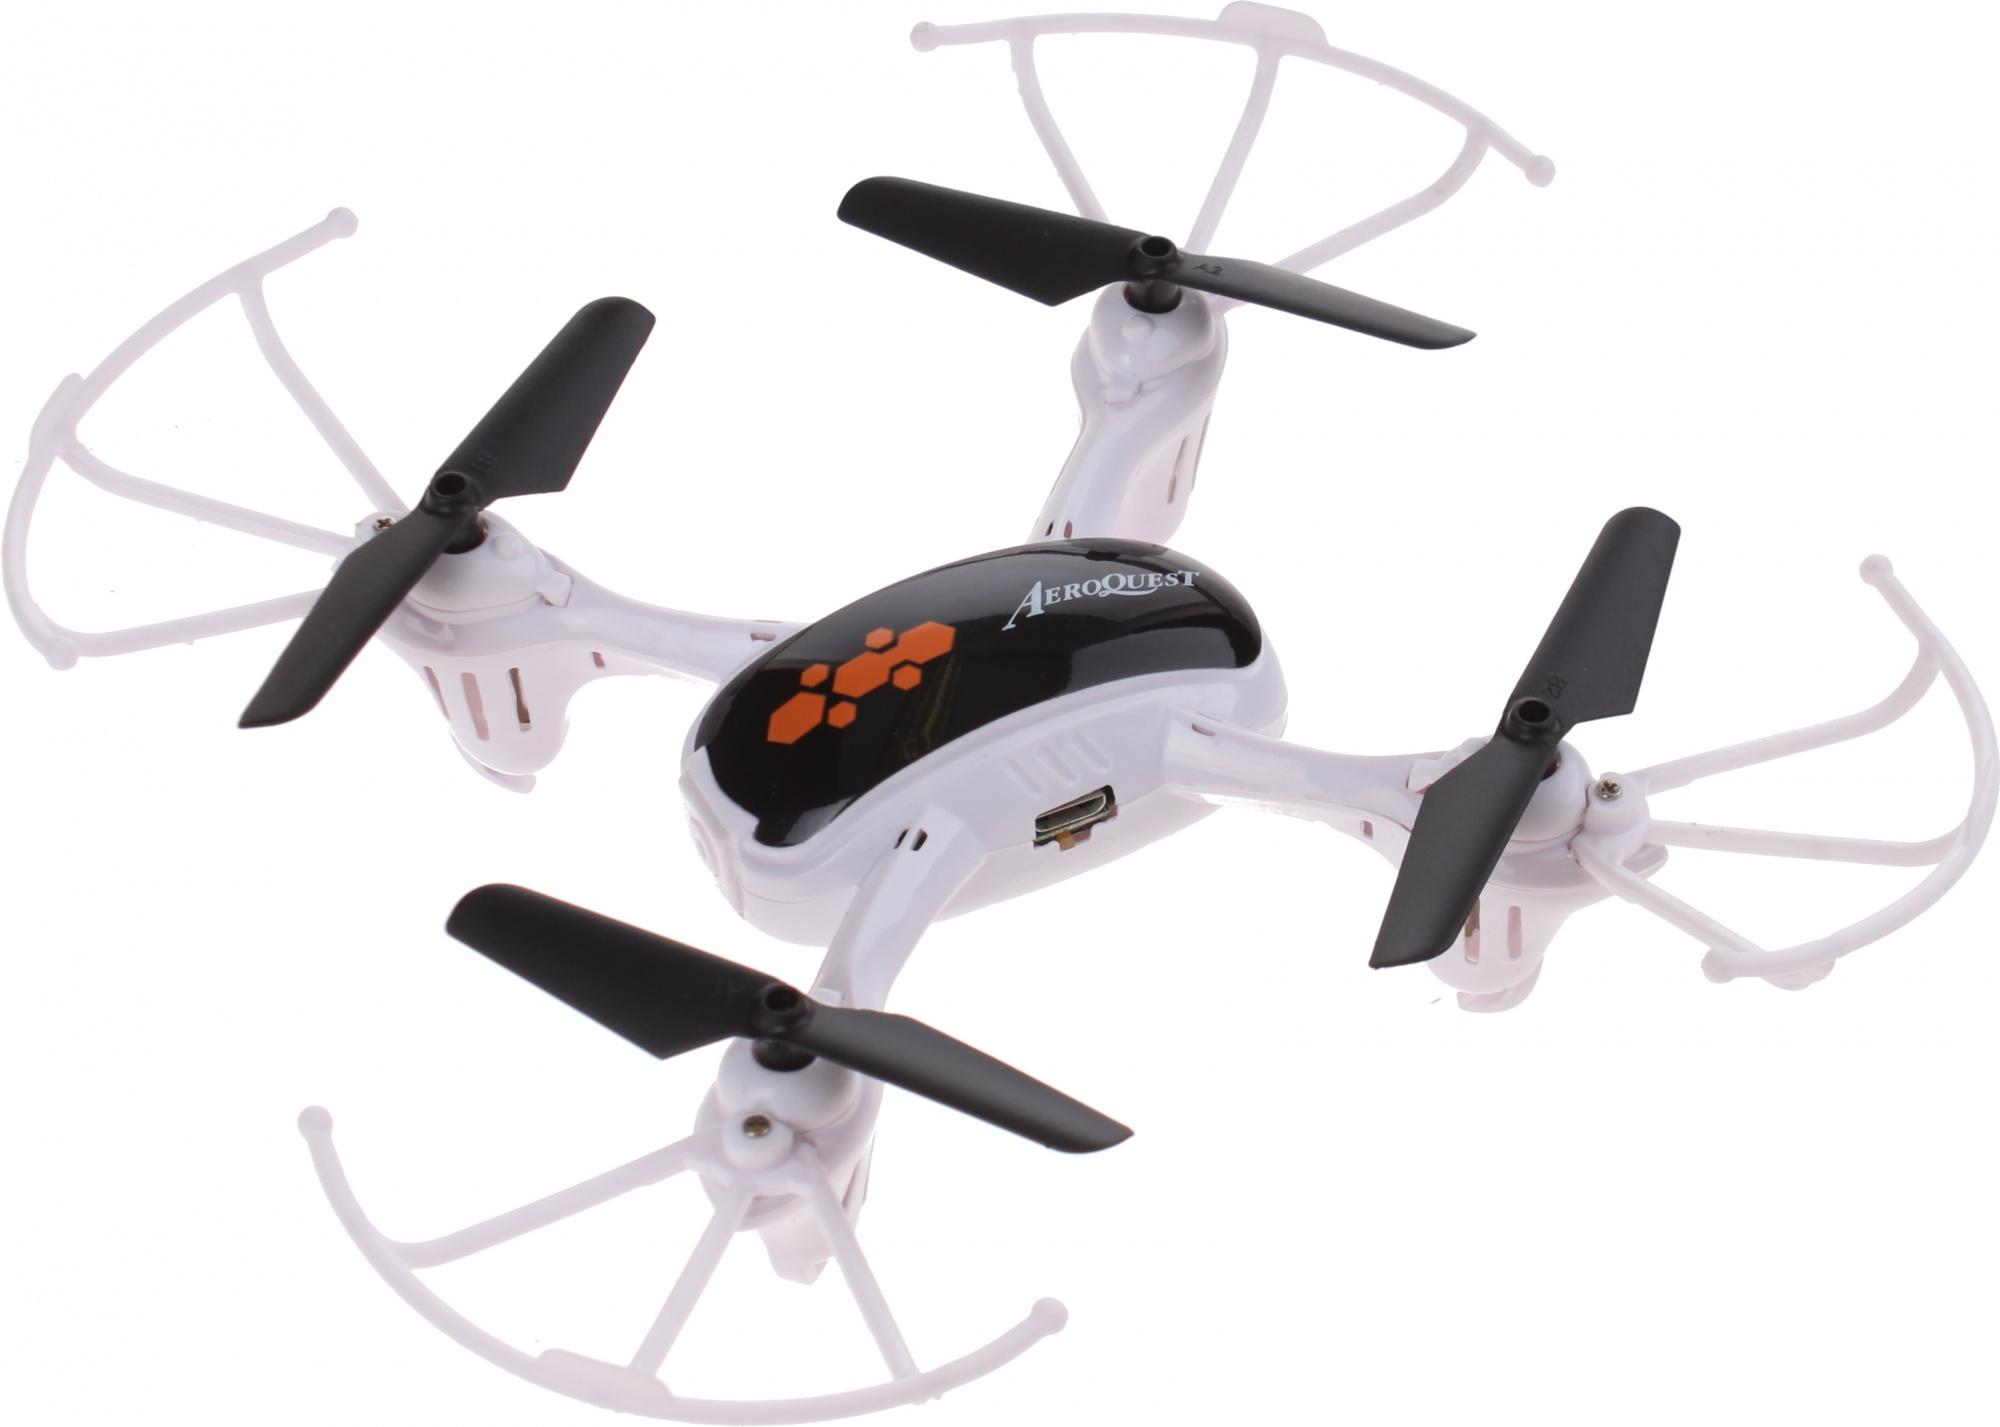 Ongebruikt TOM mini-drone 16 x 16 cm white - Internet-Toys HD-96